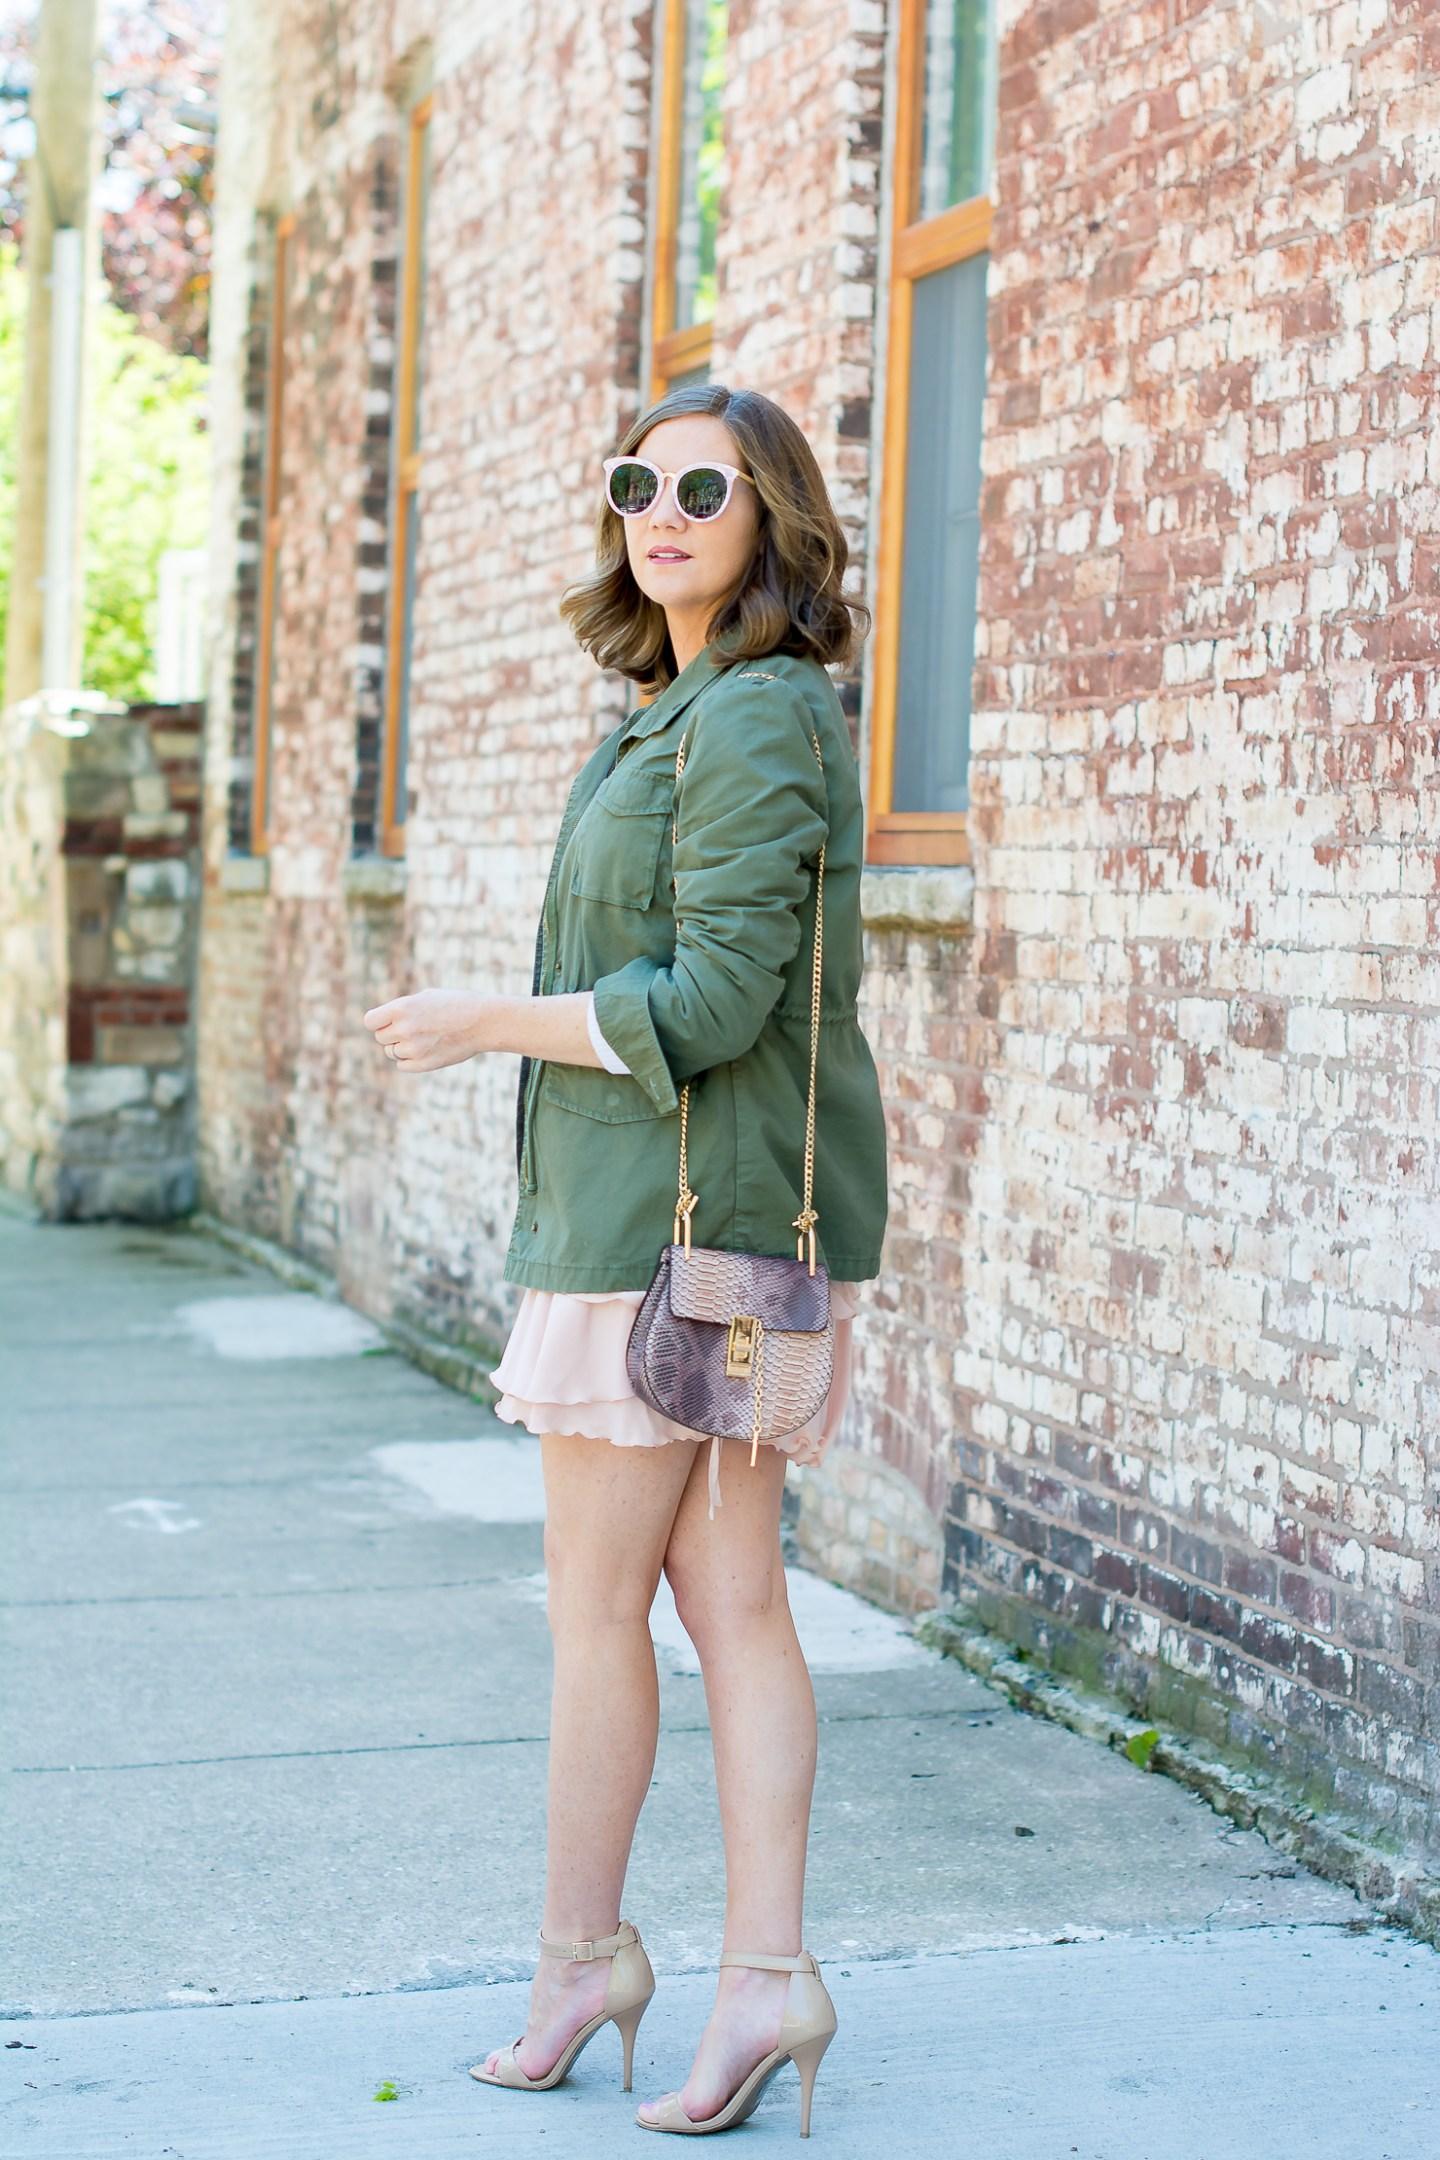 utilitarian-ruffles-who-what-wear-for-target-ruffled-skirt-white-sweater-old-navy-utility-jacket-forever-21-pink-sunglasses-chloe-drew-dupe-snakeskin-print